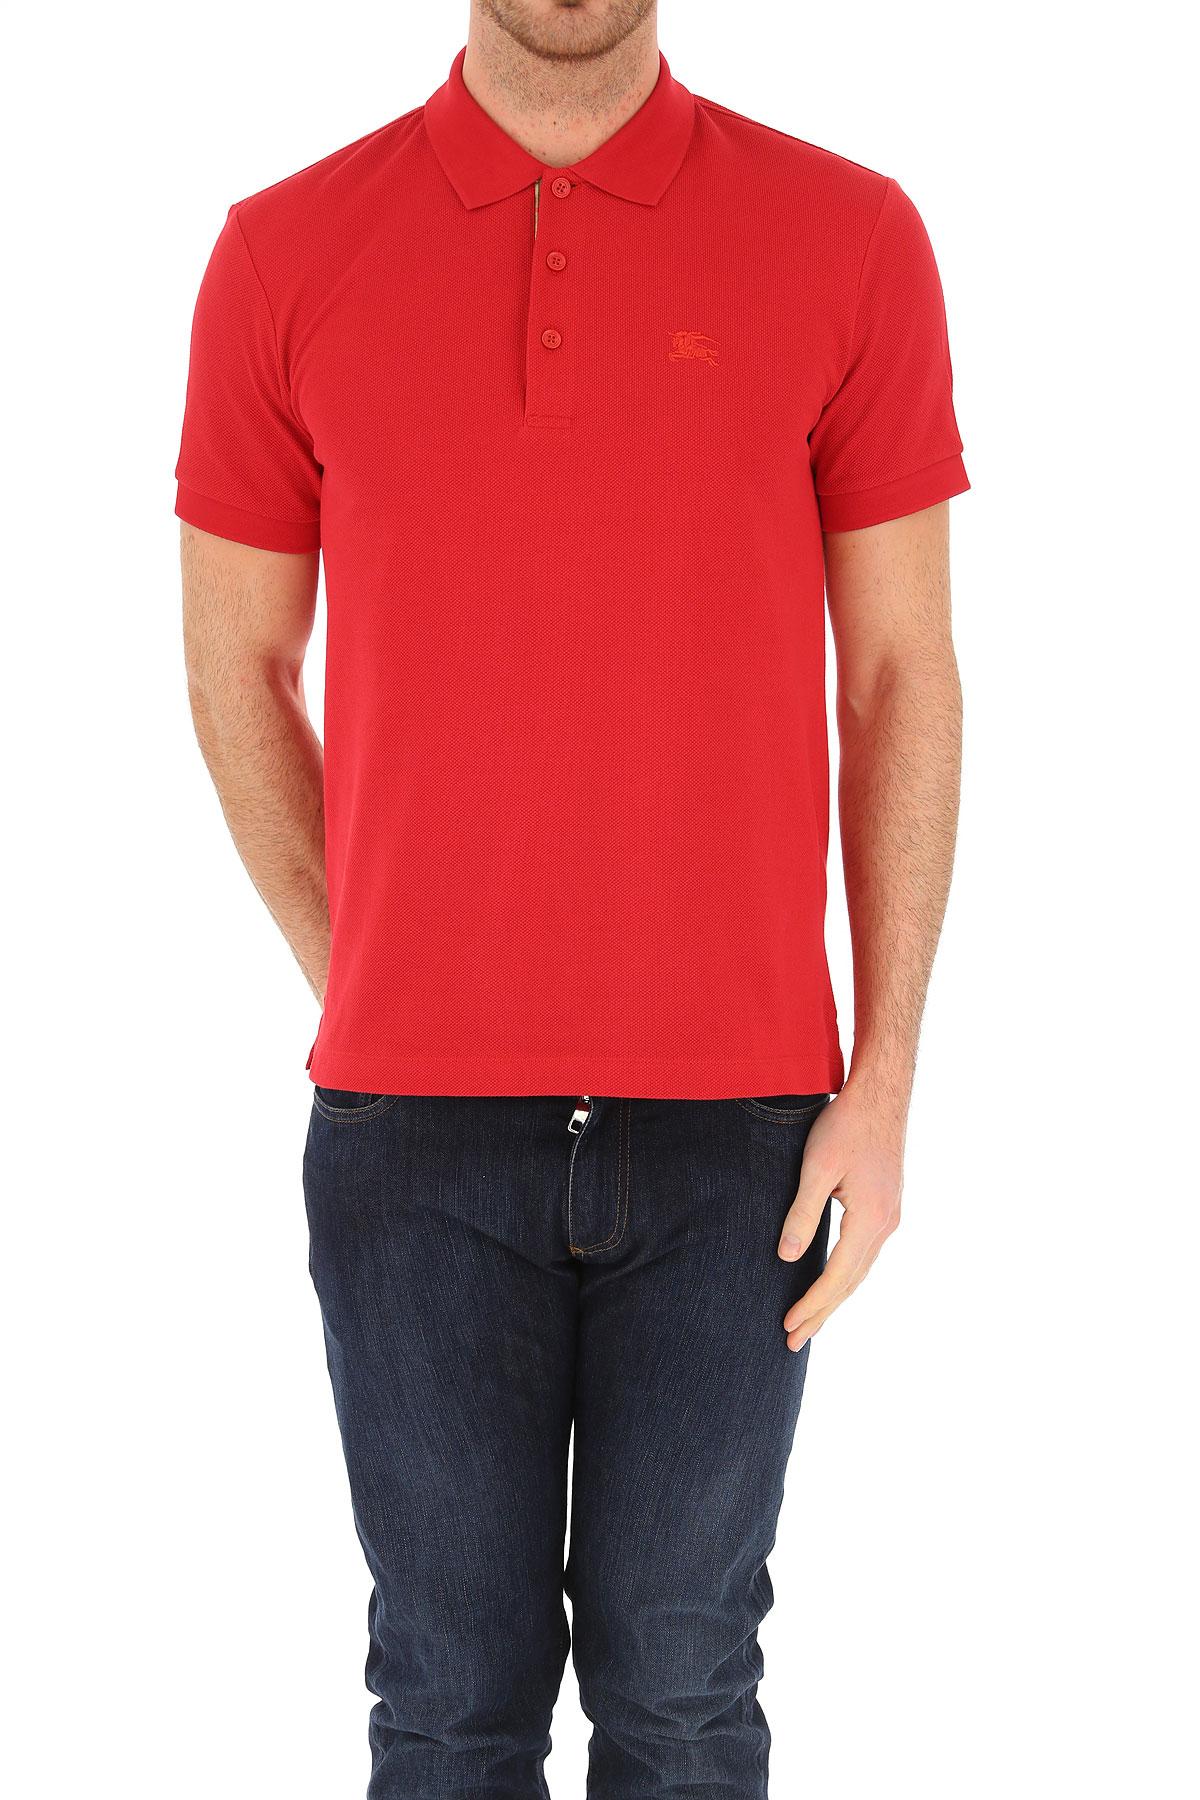 Hombres Primavera nbsp; verano Burberry Ropa Rojo 2019 Para qEvZwwt